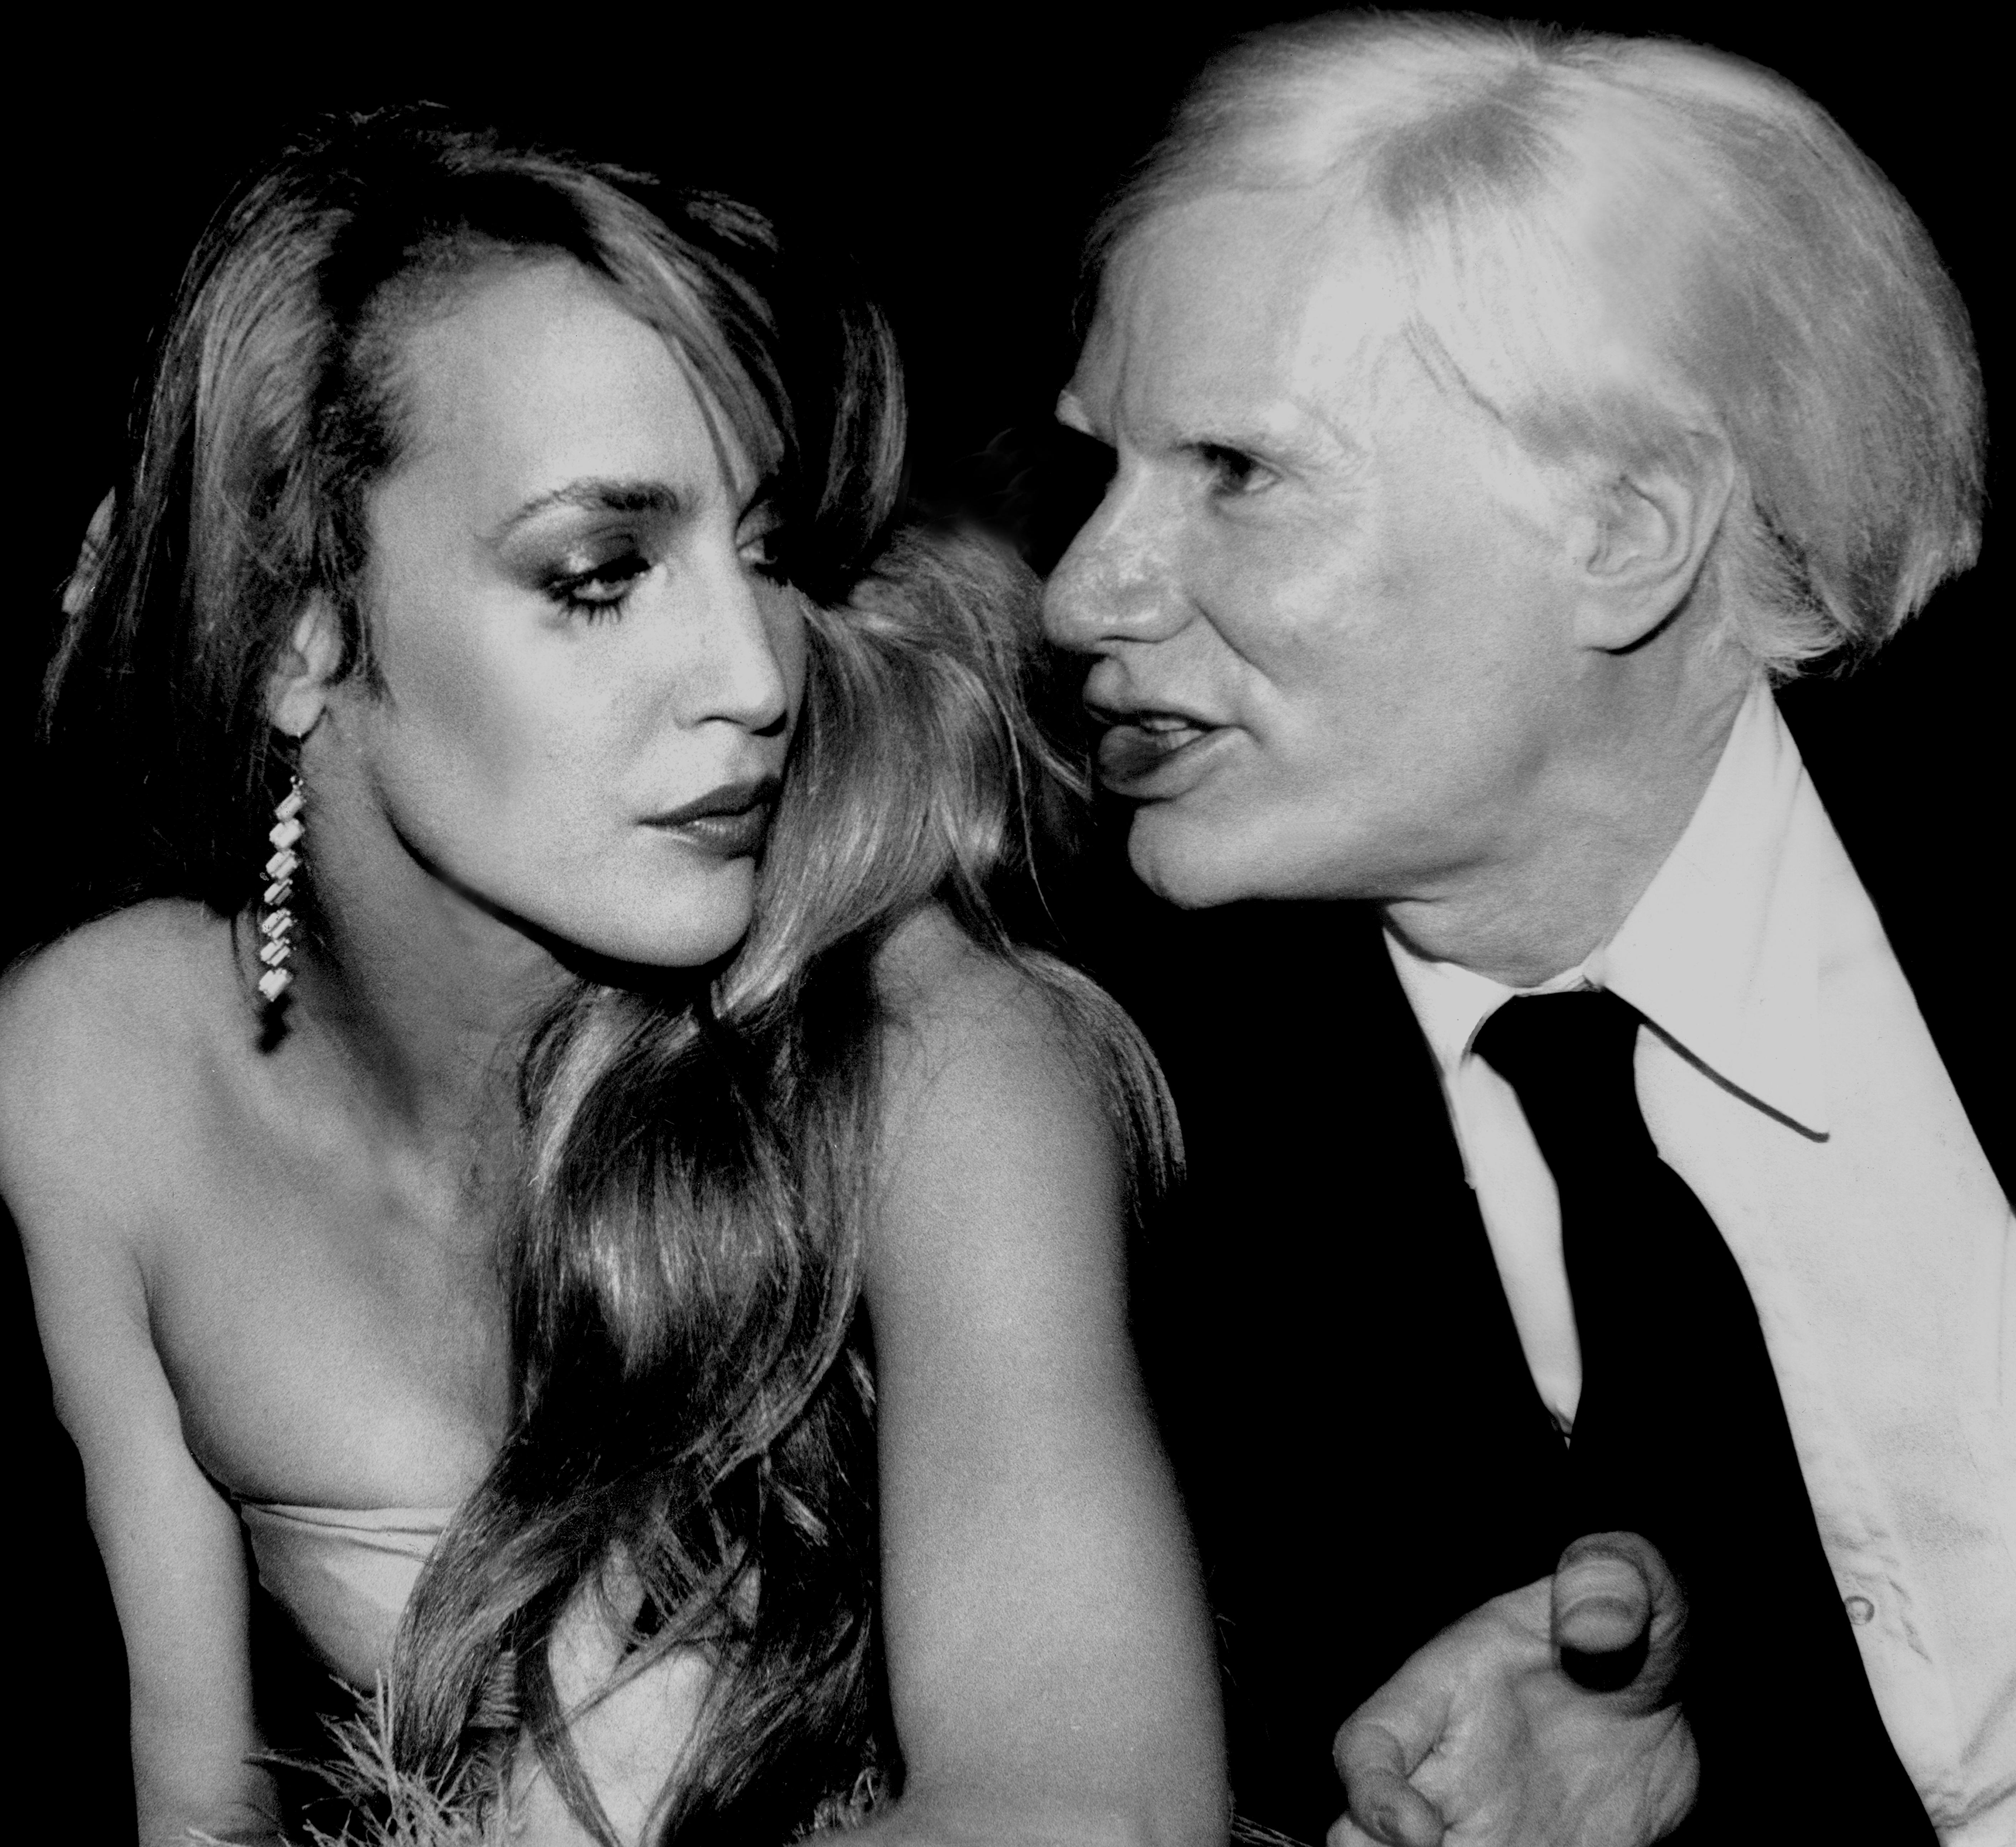 Jerry Hall & Andy Warhol